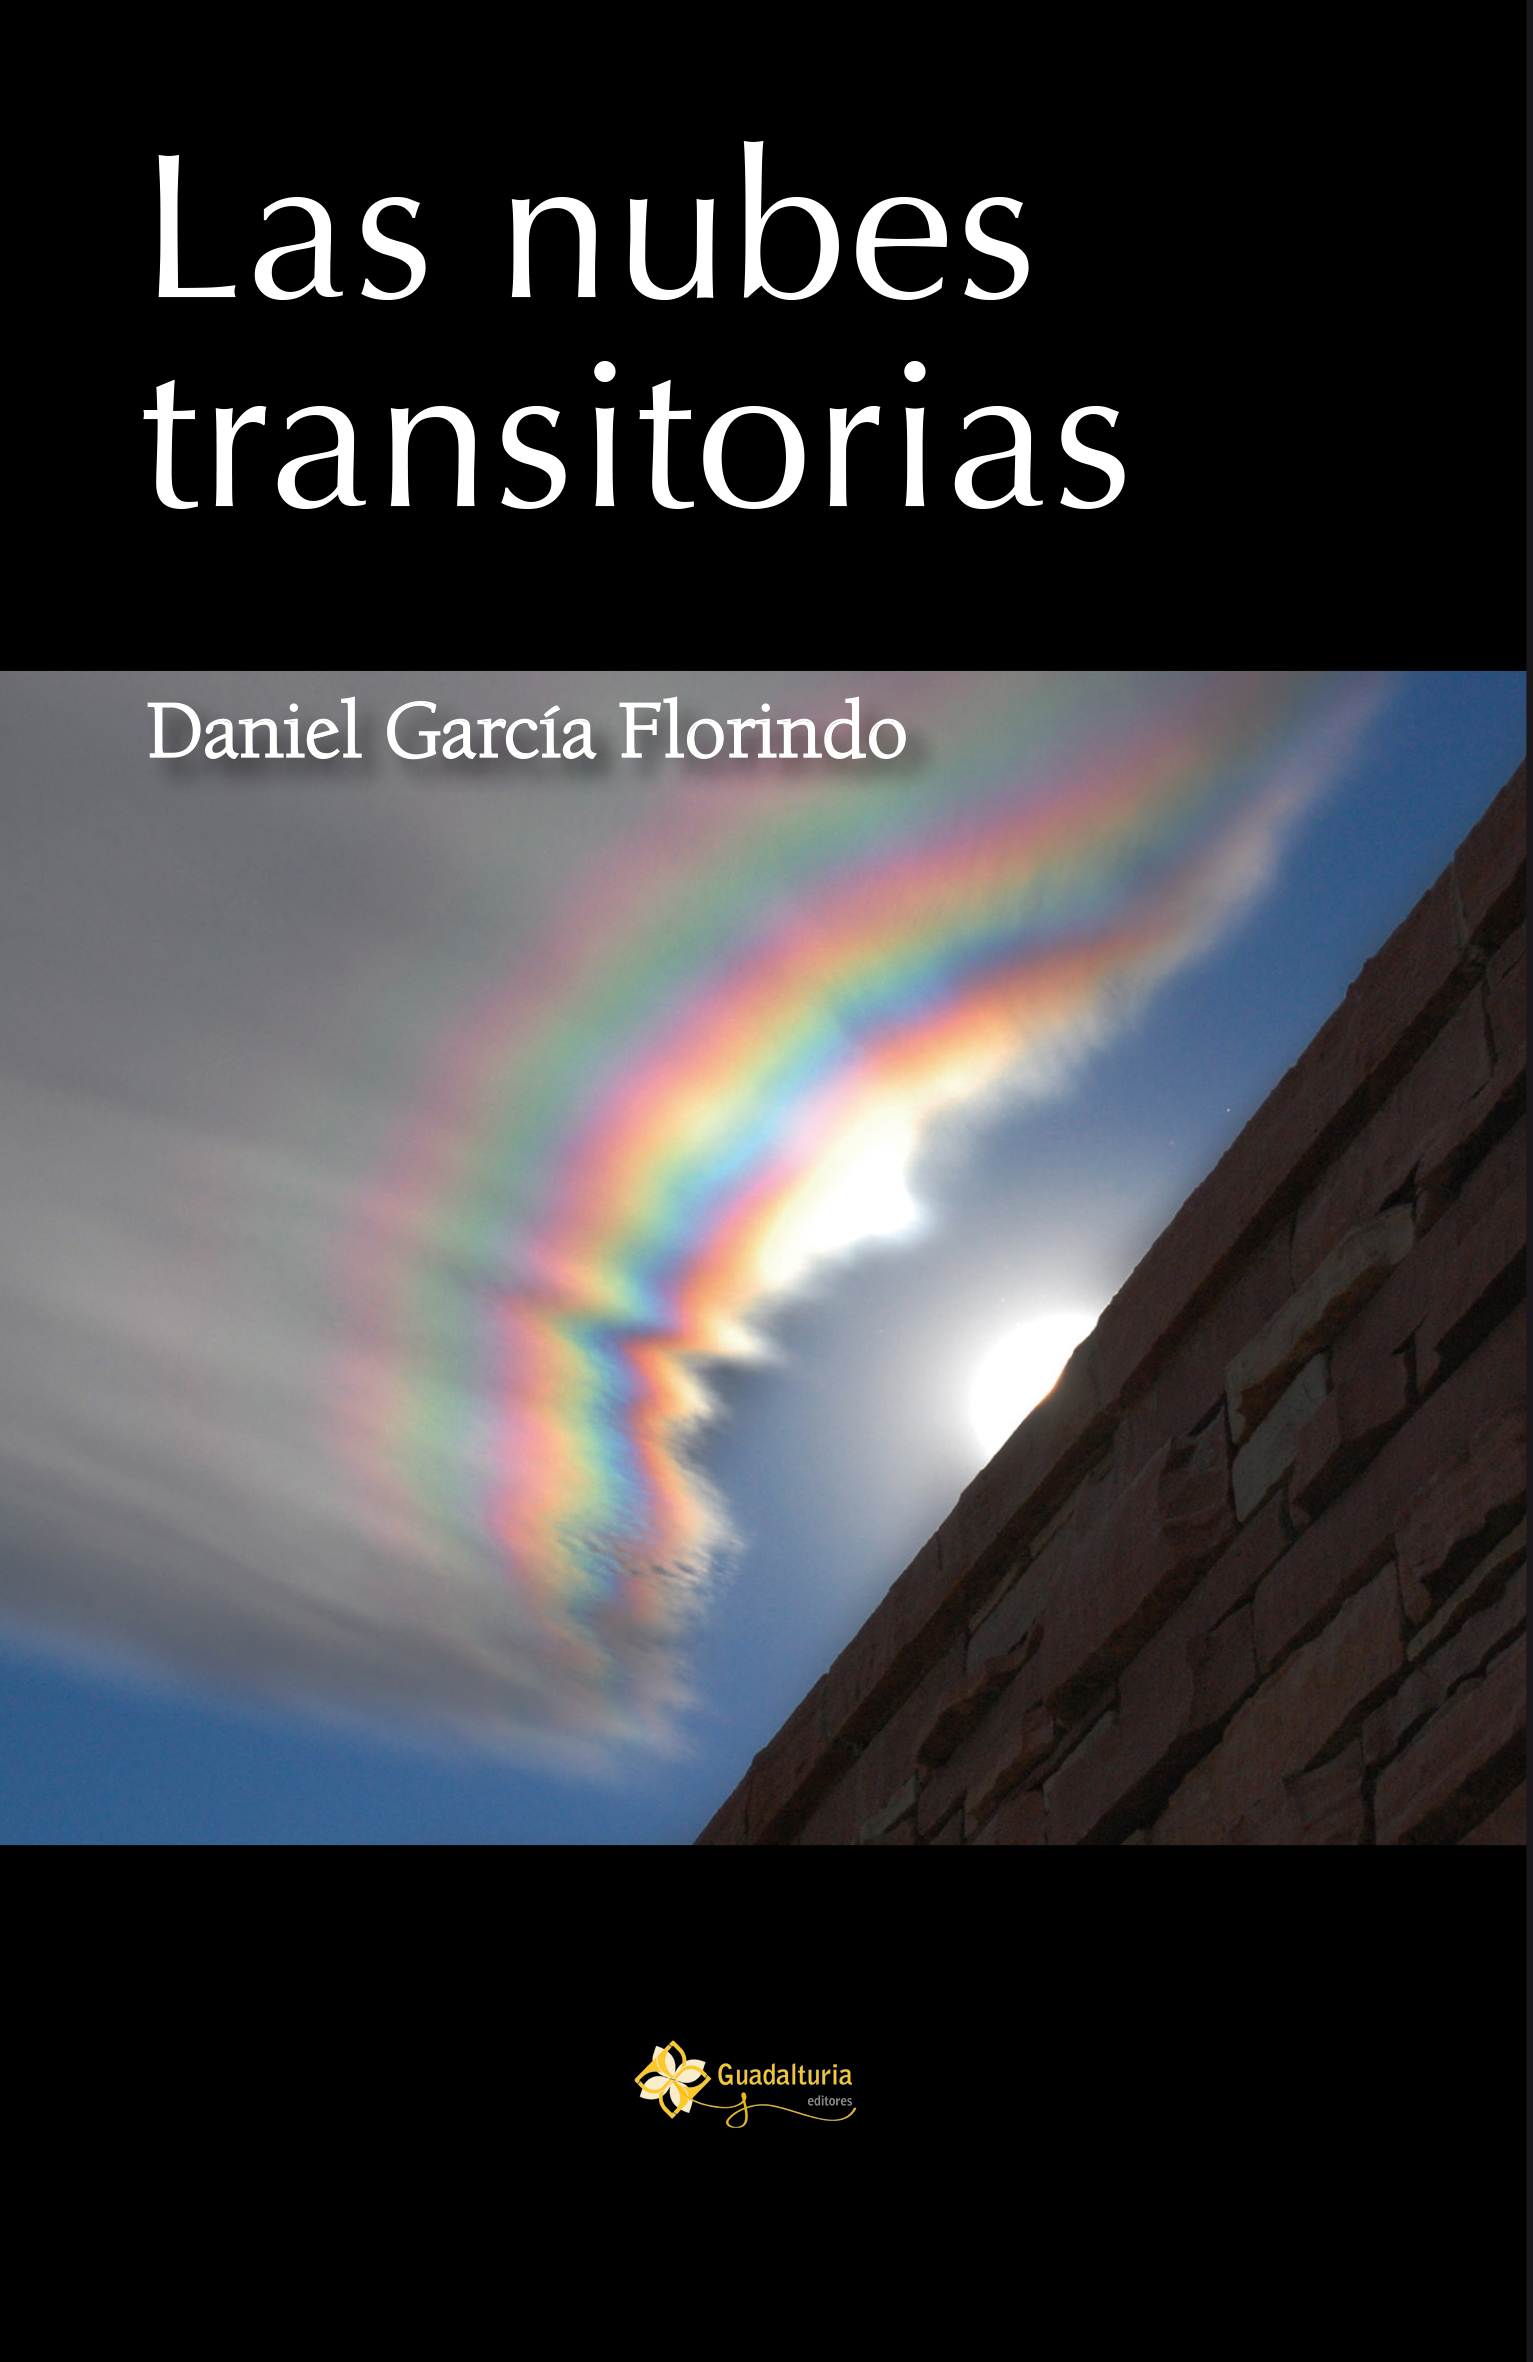 Cubierta_Las nubes transitorias